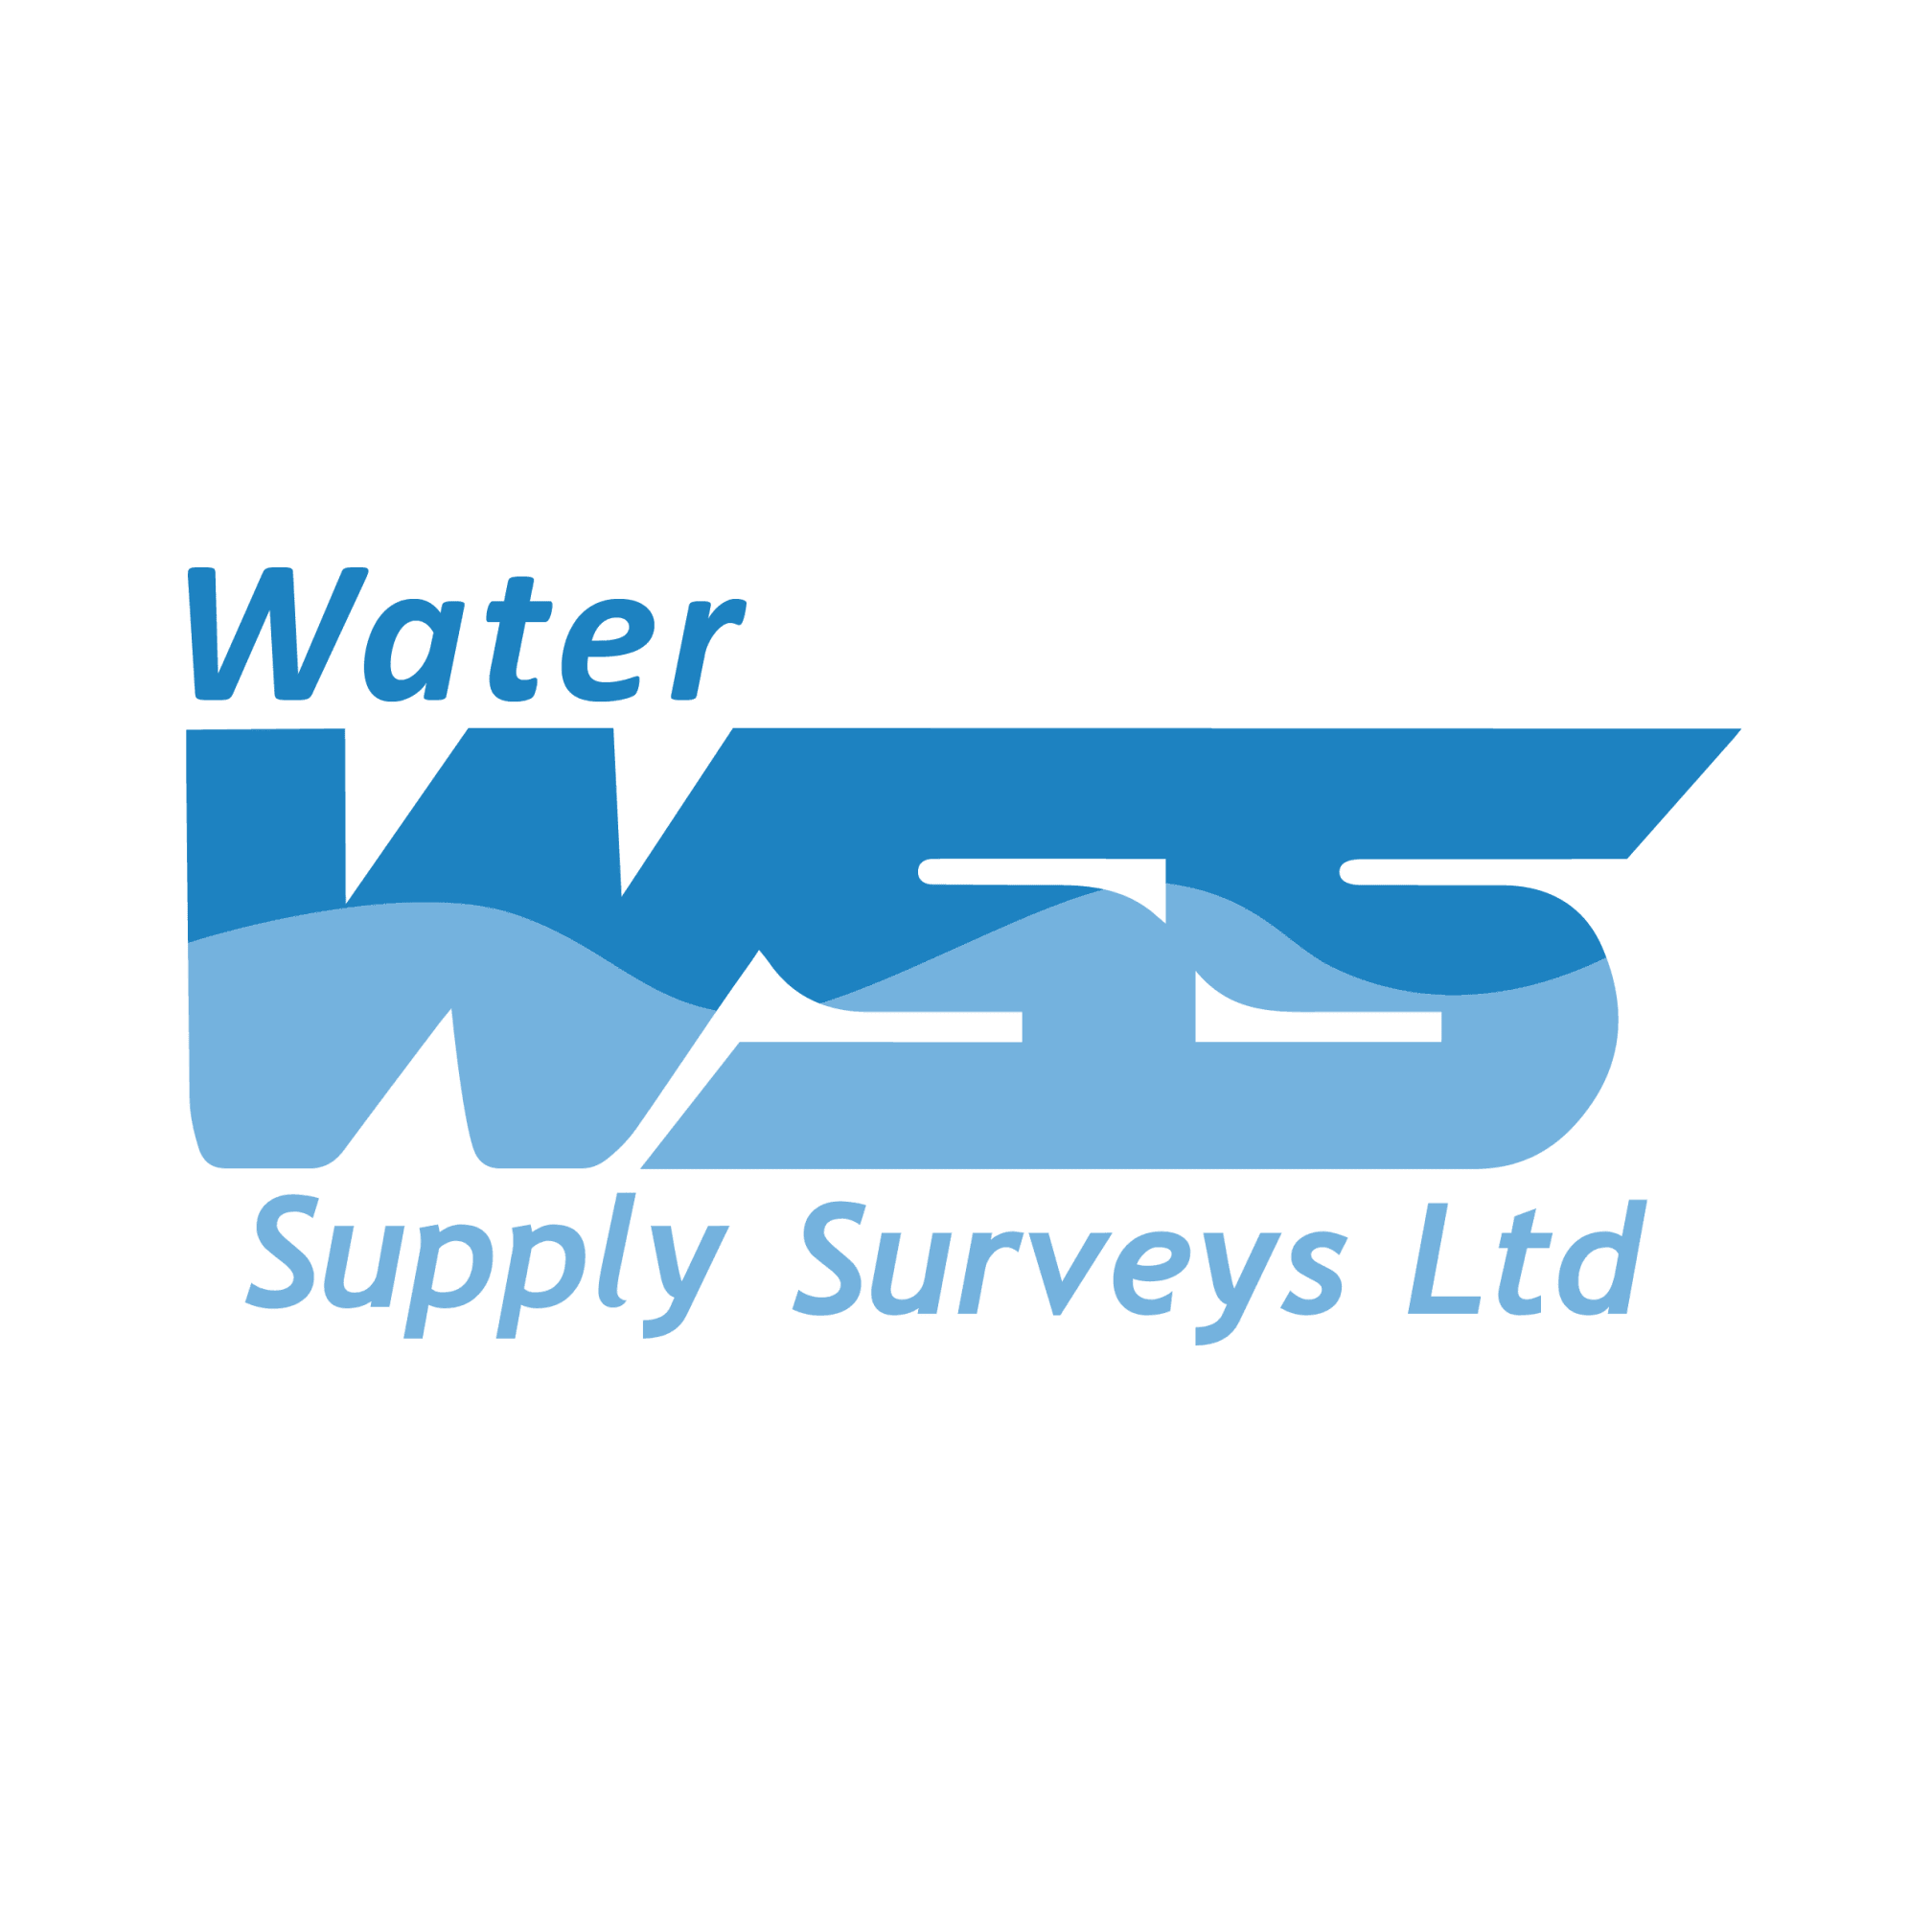 Water Supply Surveys Ltd - Gillingham, Kent ME7 3NH - 07415 319033 | ShowMeLocal.com